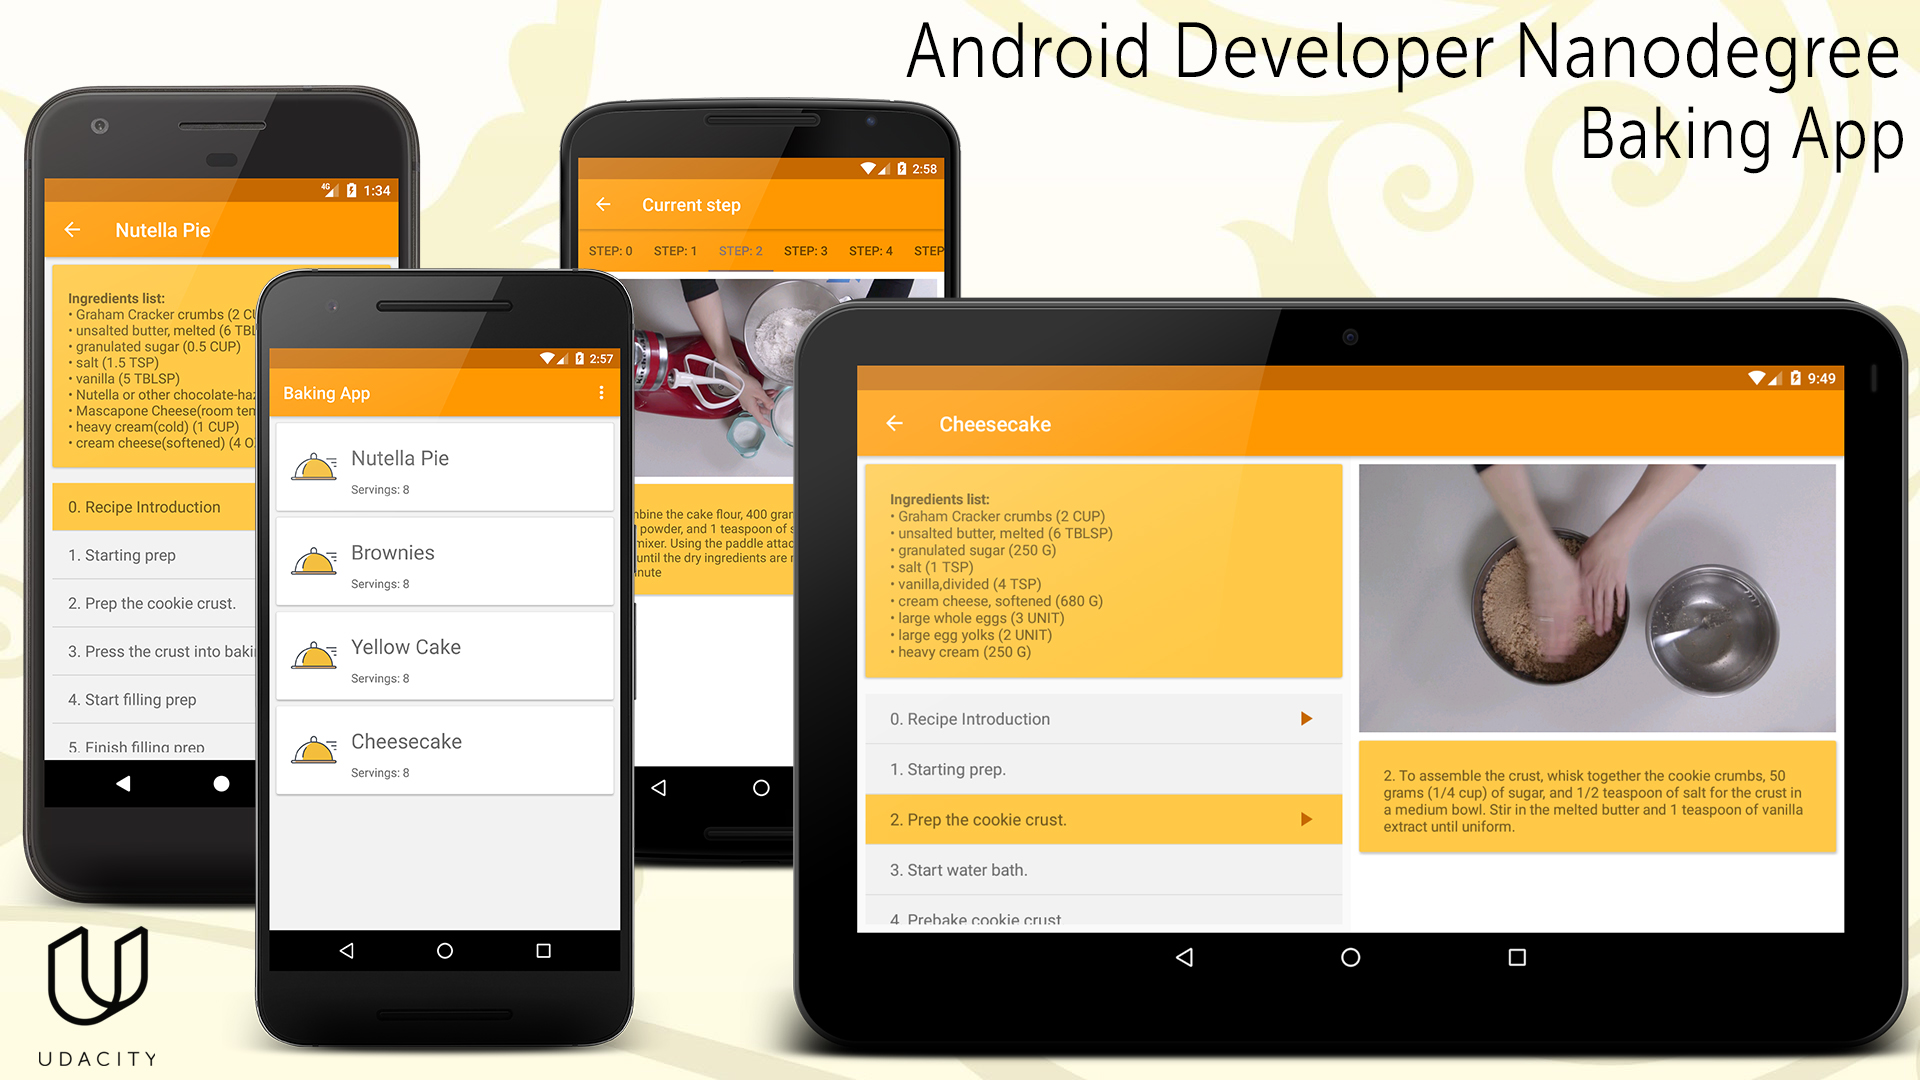 Github Djkovrik Bakingapp Udacity Android Developer Nanodegree